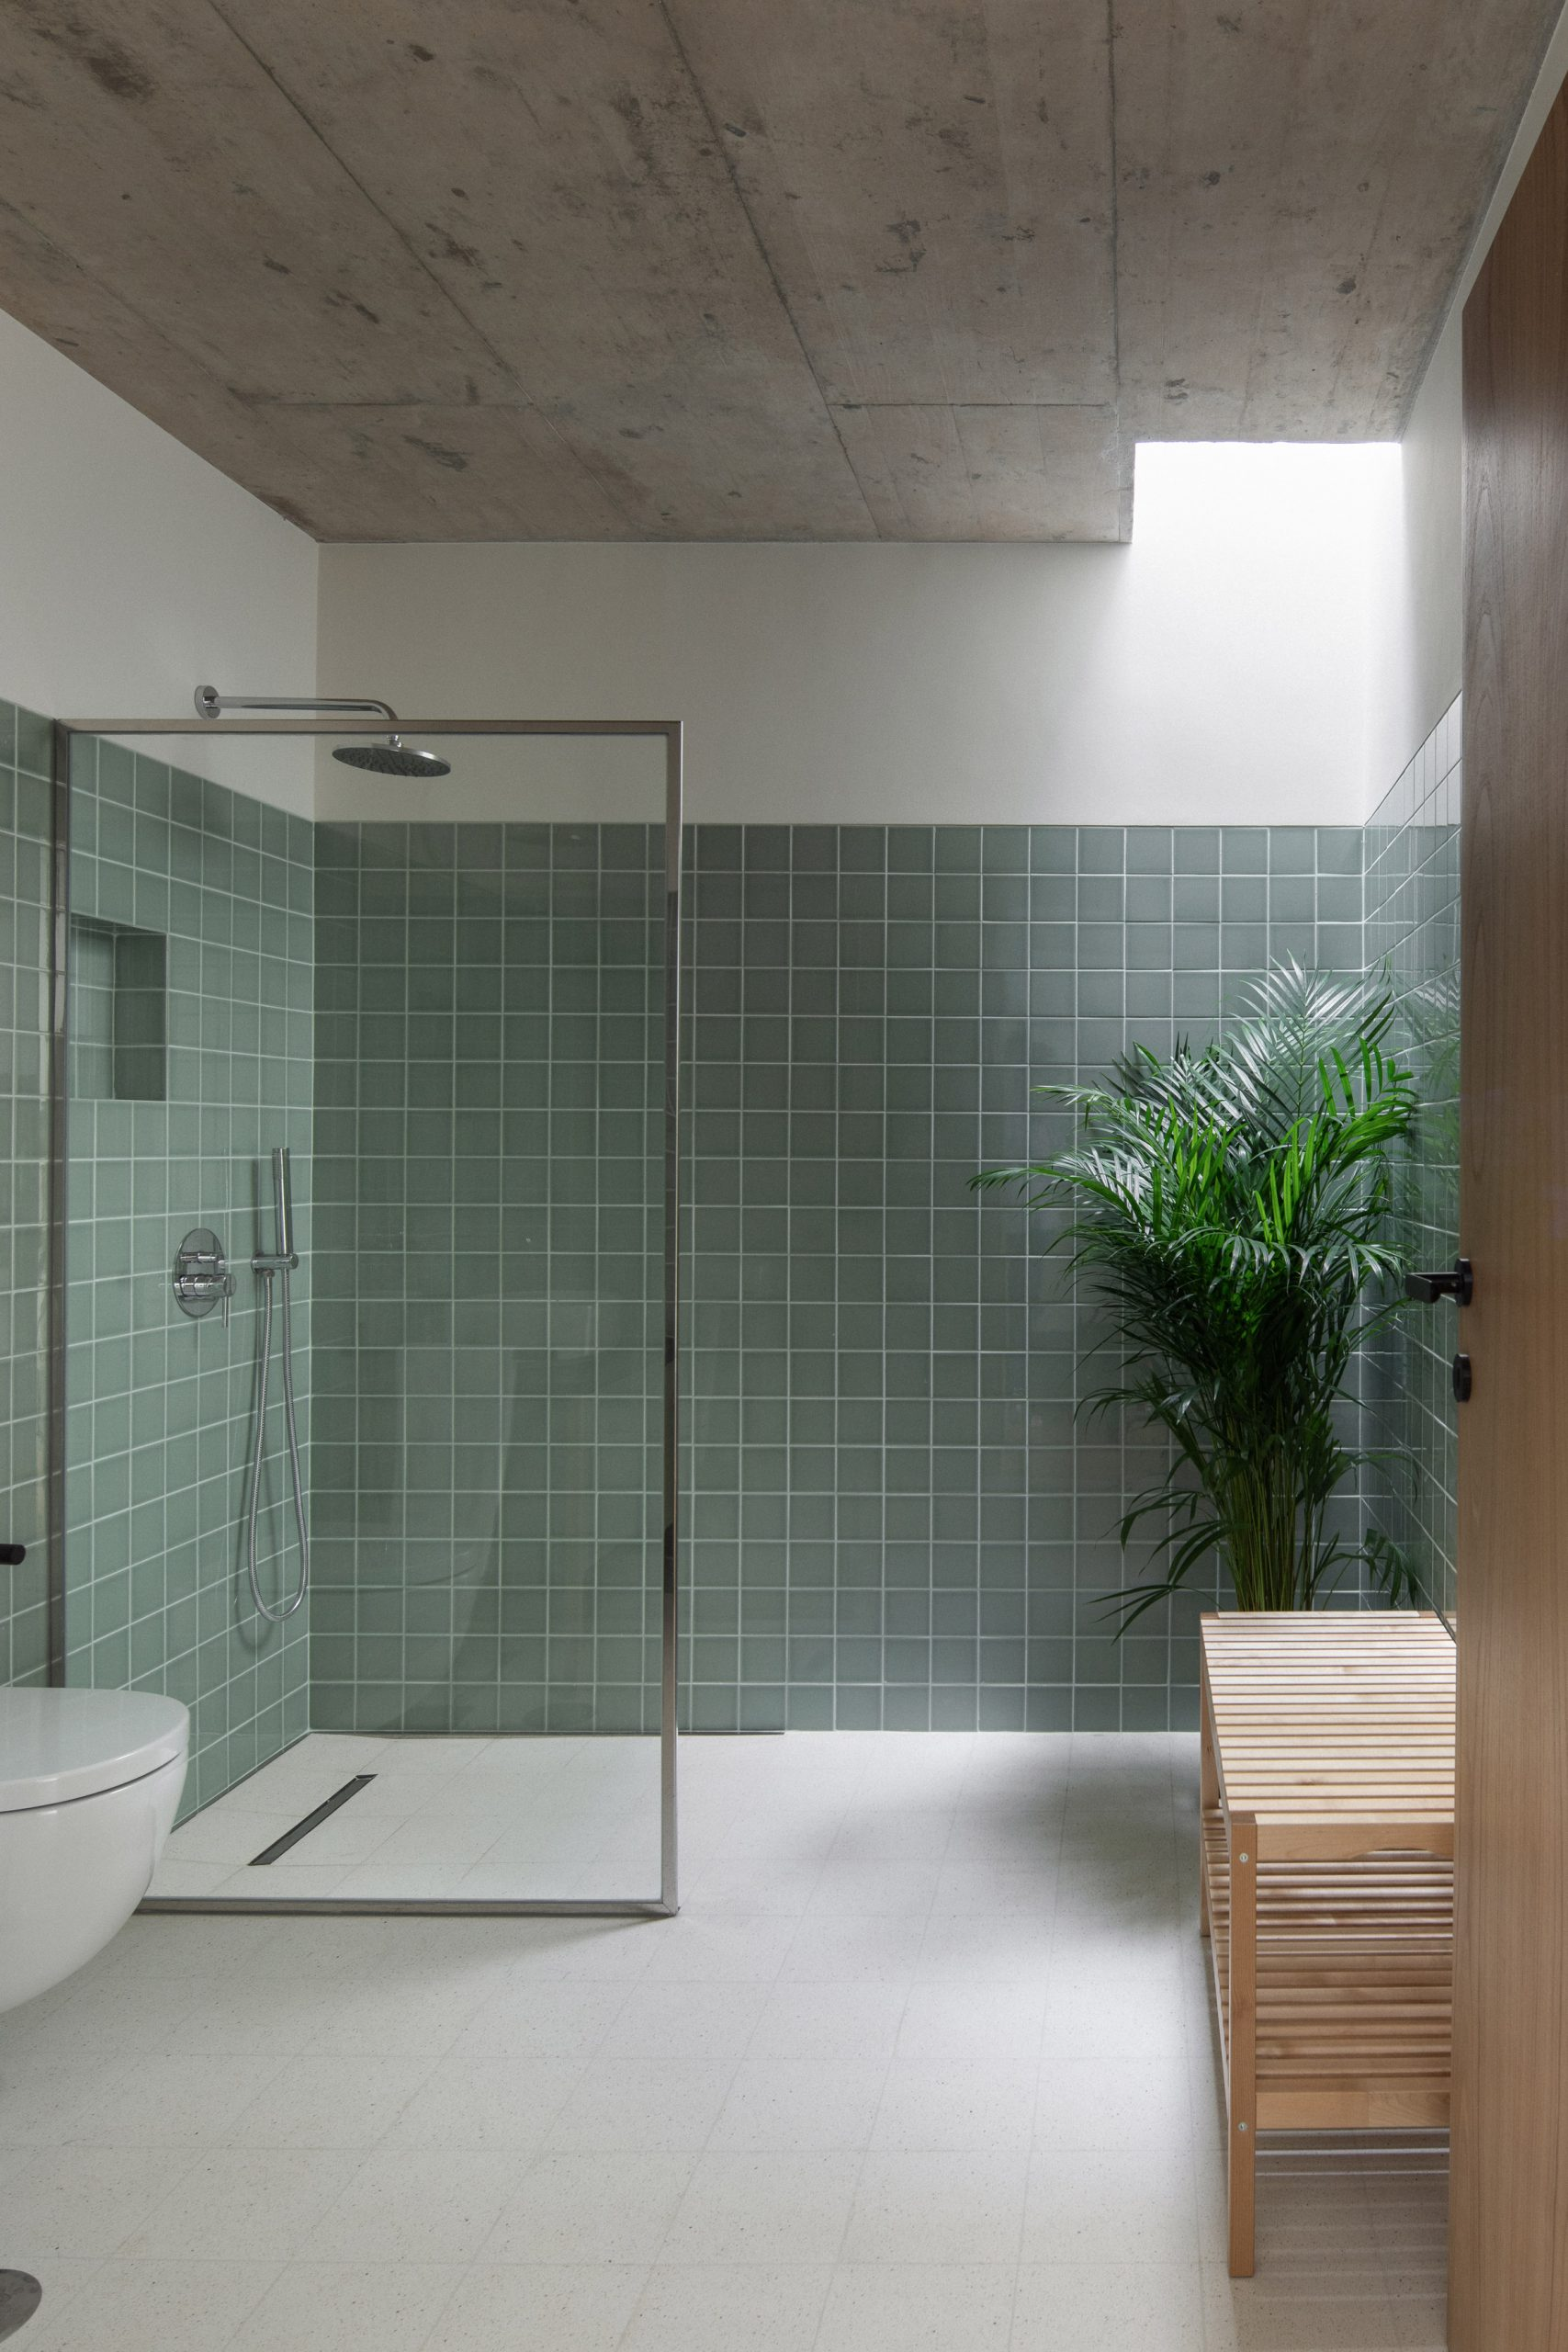 Its bathroom employs a sage tiled design